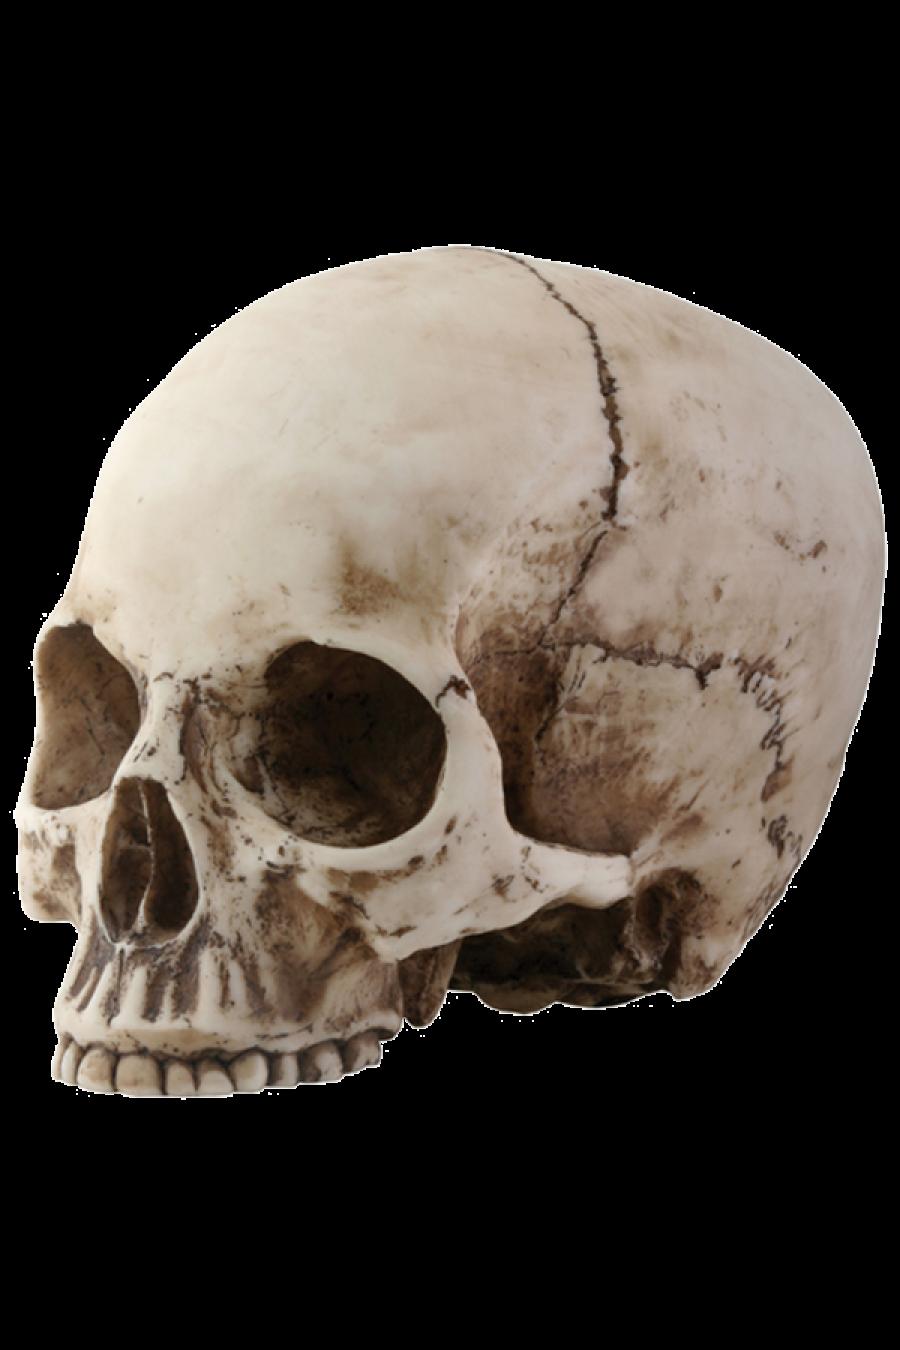 Skull Png Image - Skeleton Head, Transparent background PNG HD thumbnail